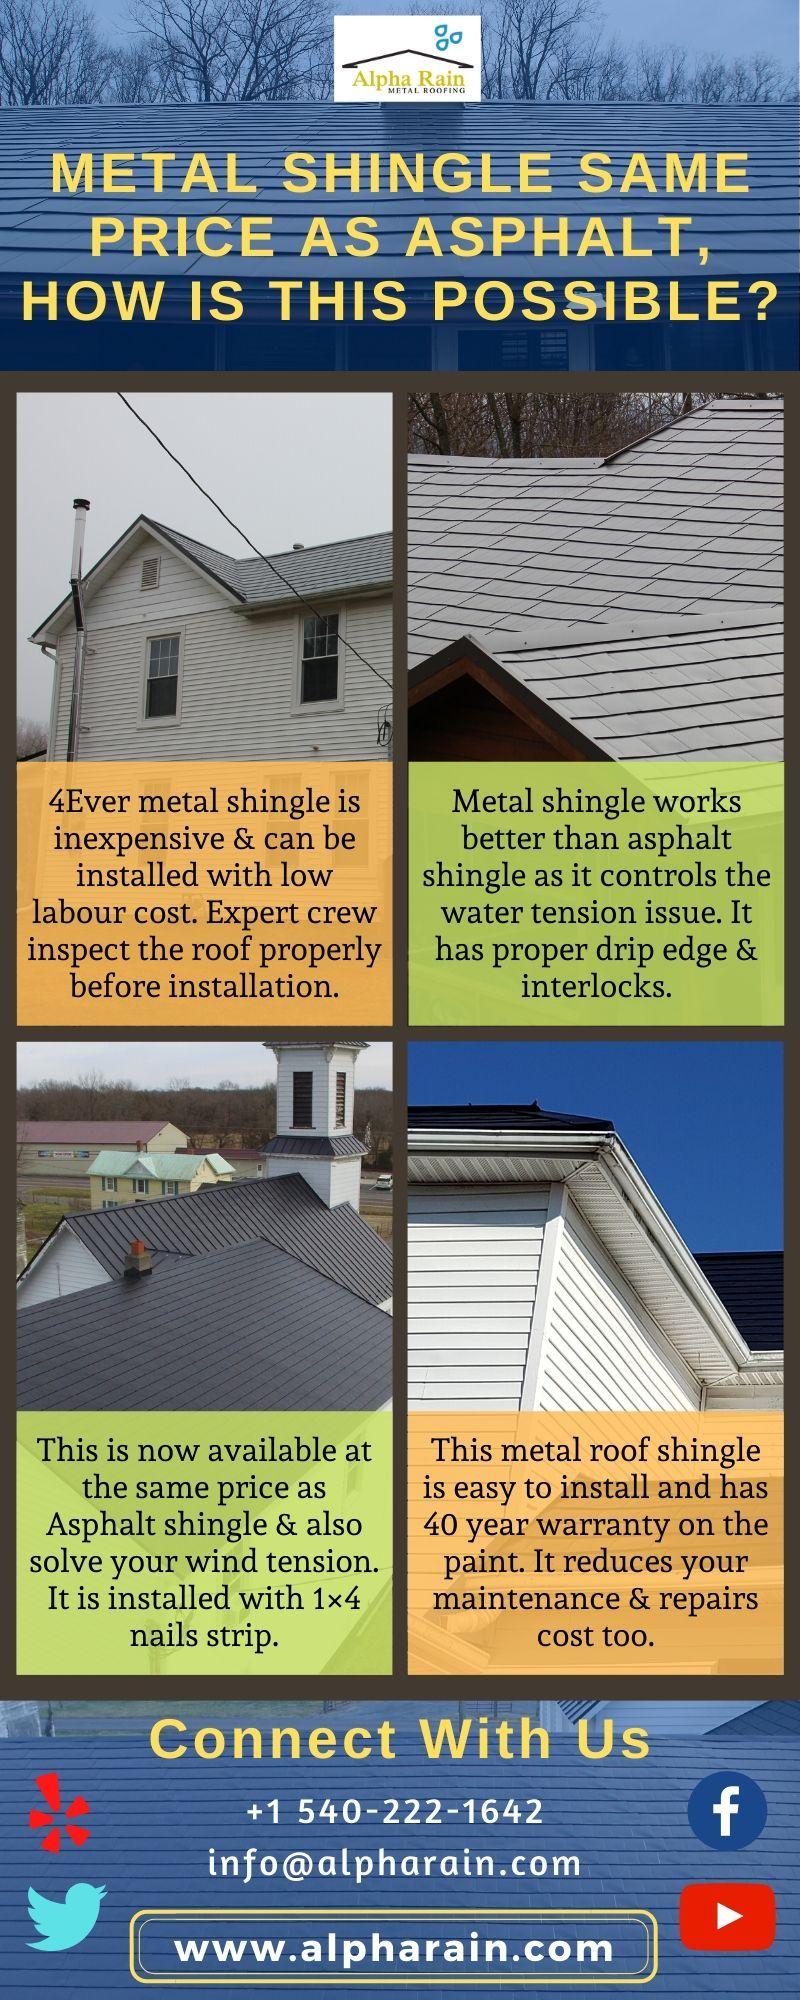 Is Metal Shingle Is Expensive Than Asphalt Shingle In 2020 Metal Shingles Asphalt Shingles Shingling